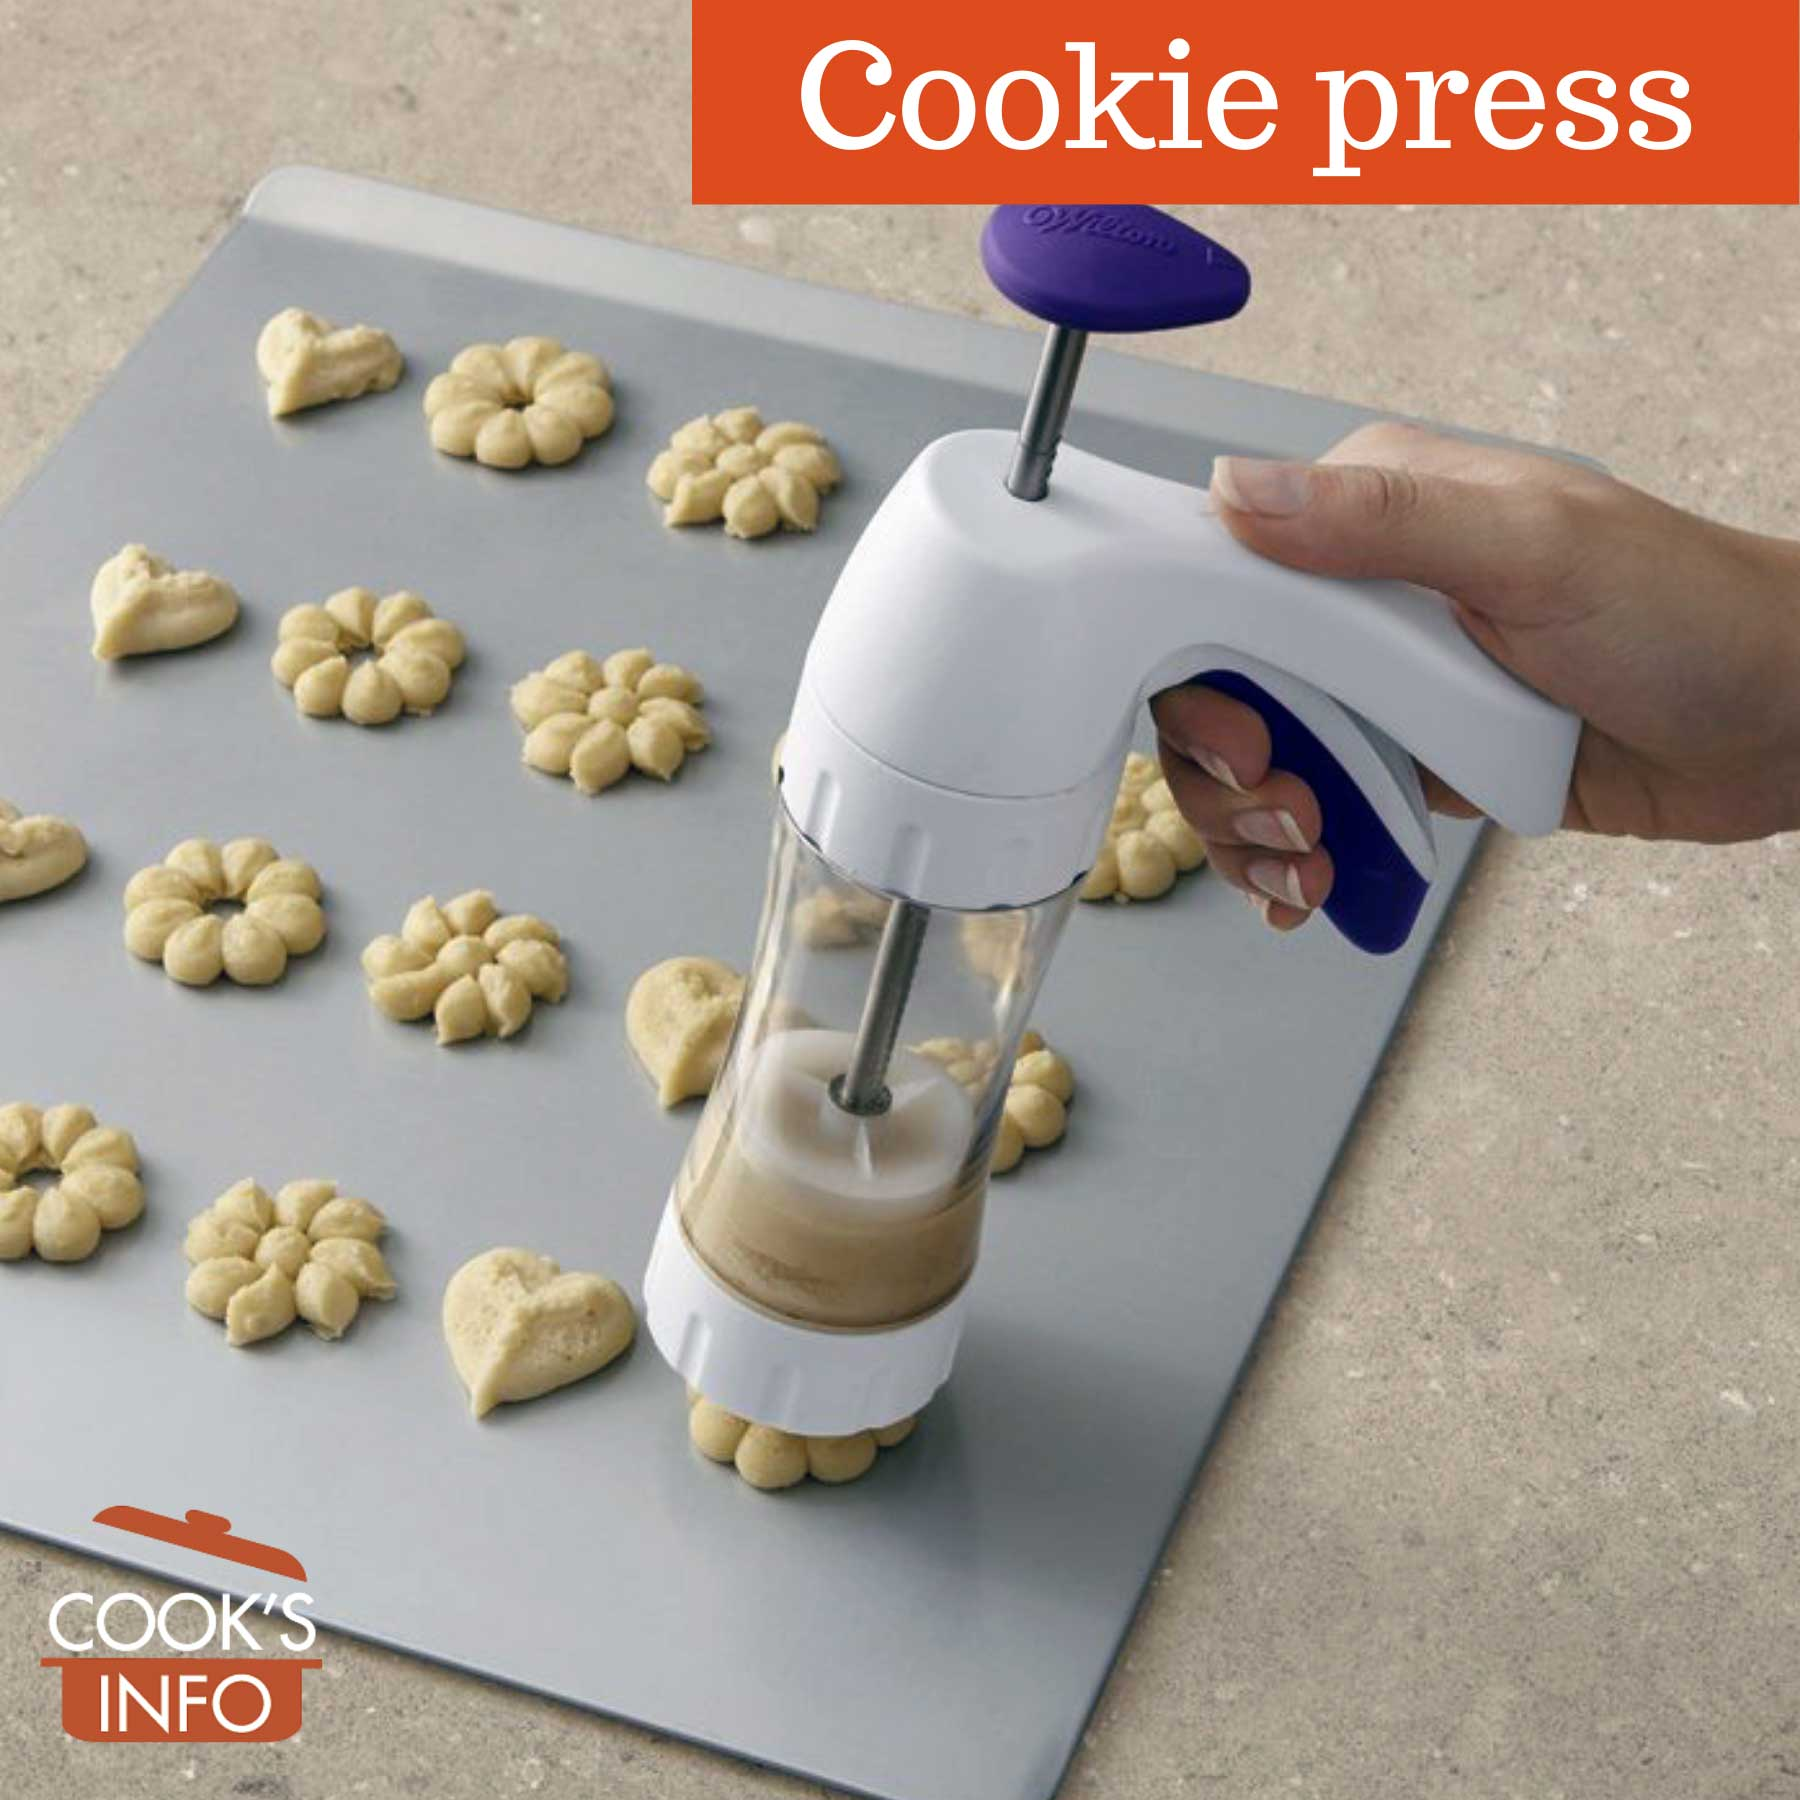 Pistol-style cookie press